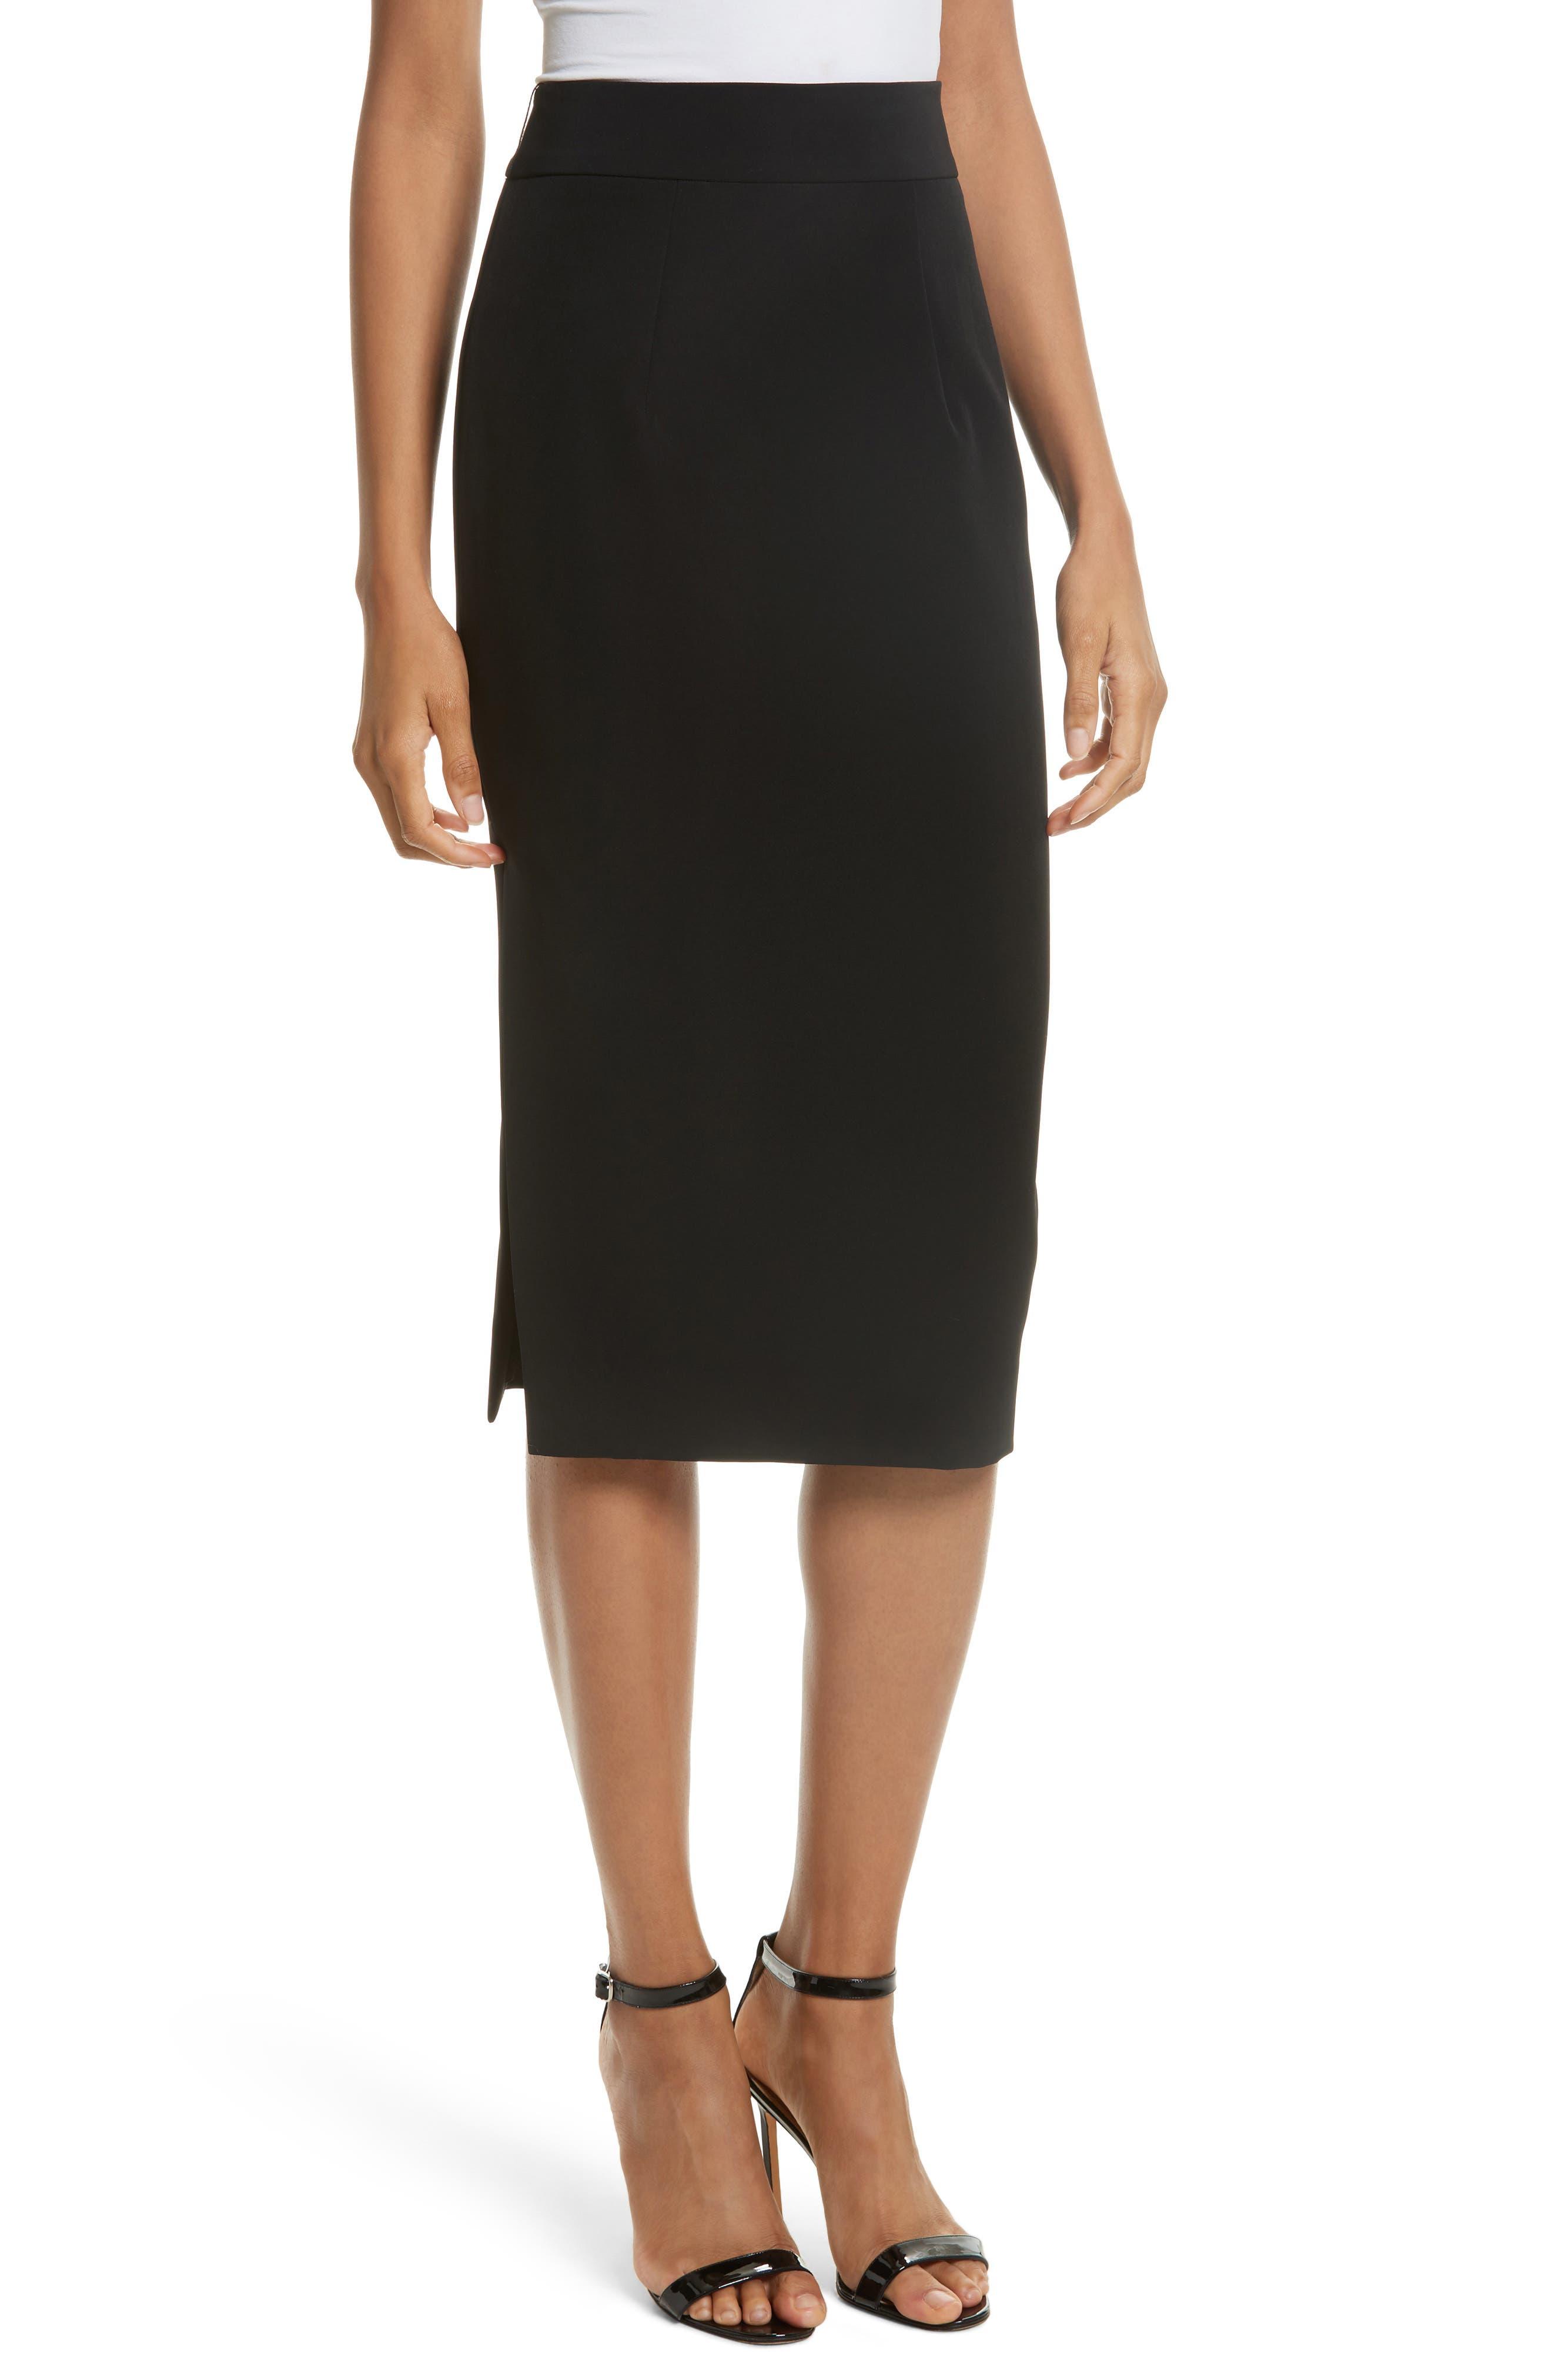 Milly Italian Cady Side Slit Skirt